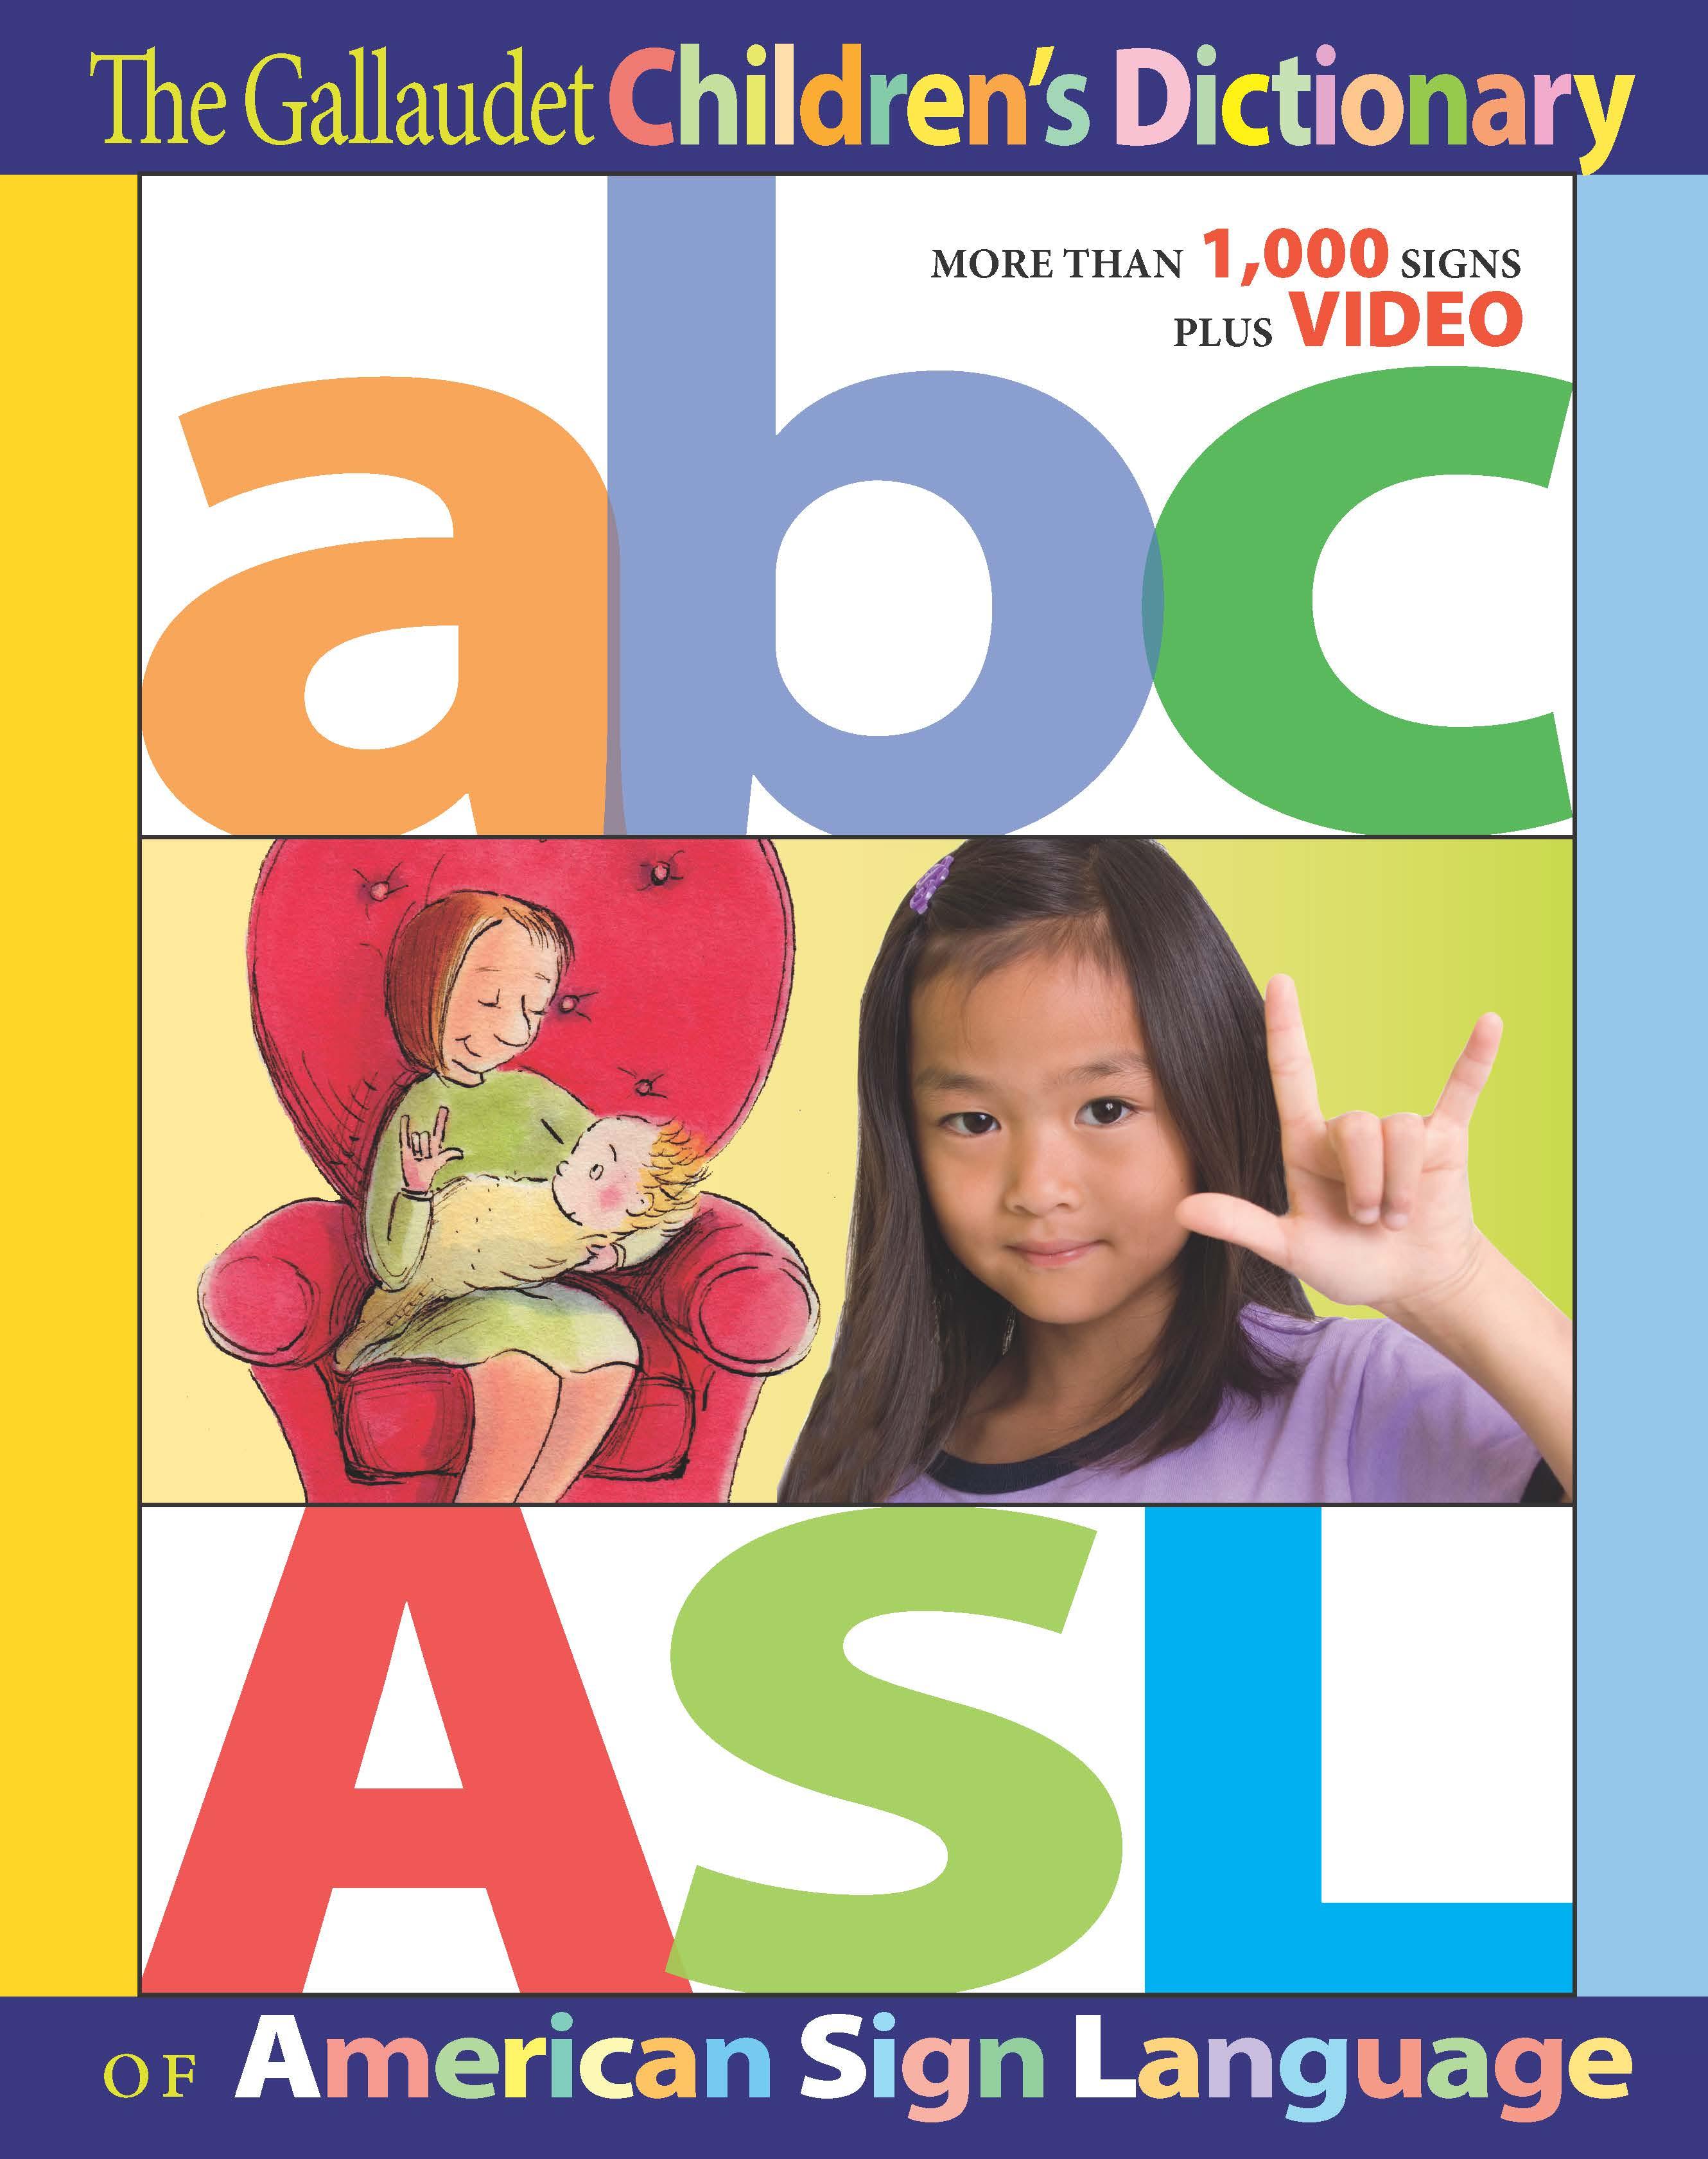 Gallaudet Children's Dictionary of American Sign Language